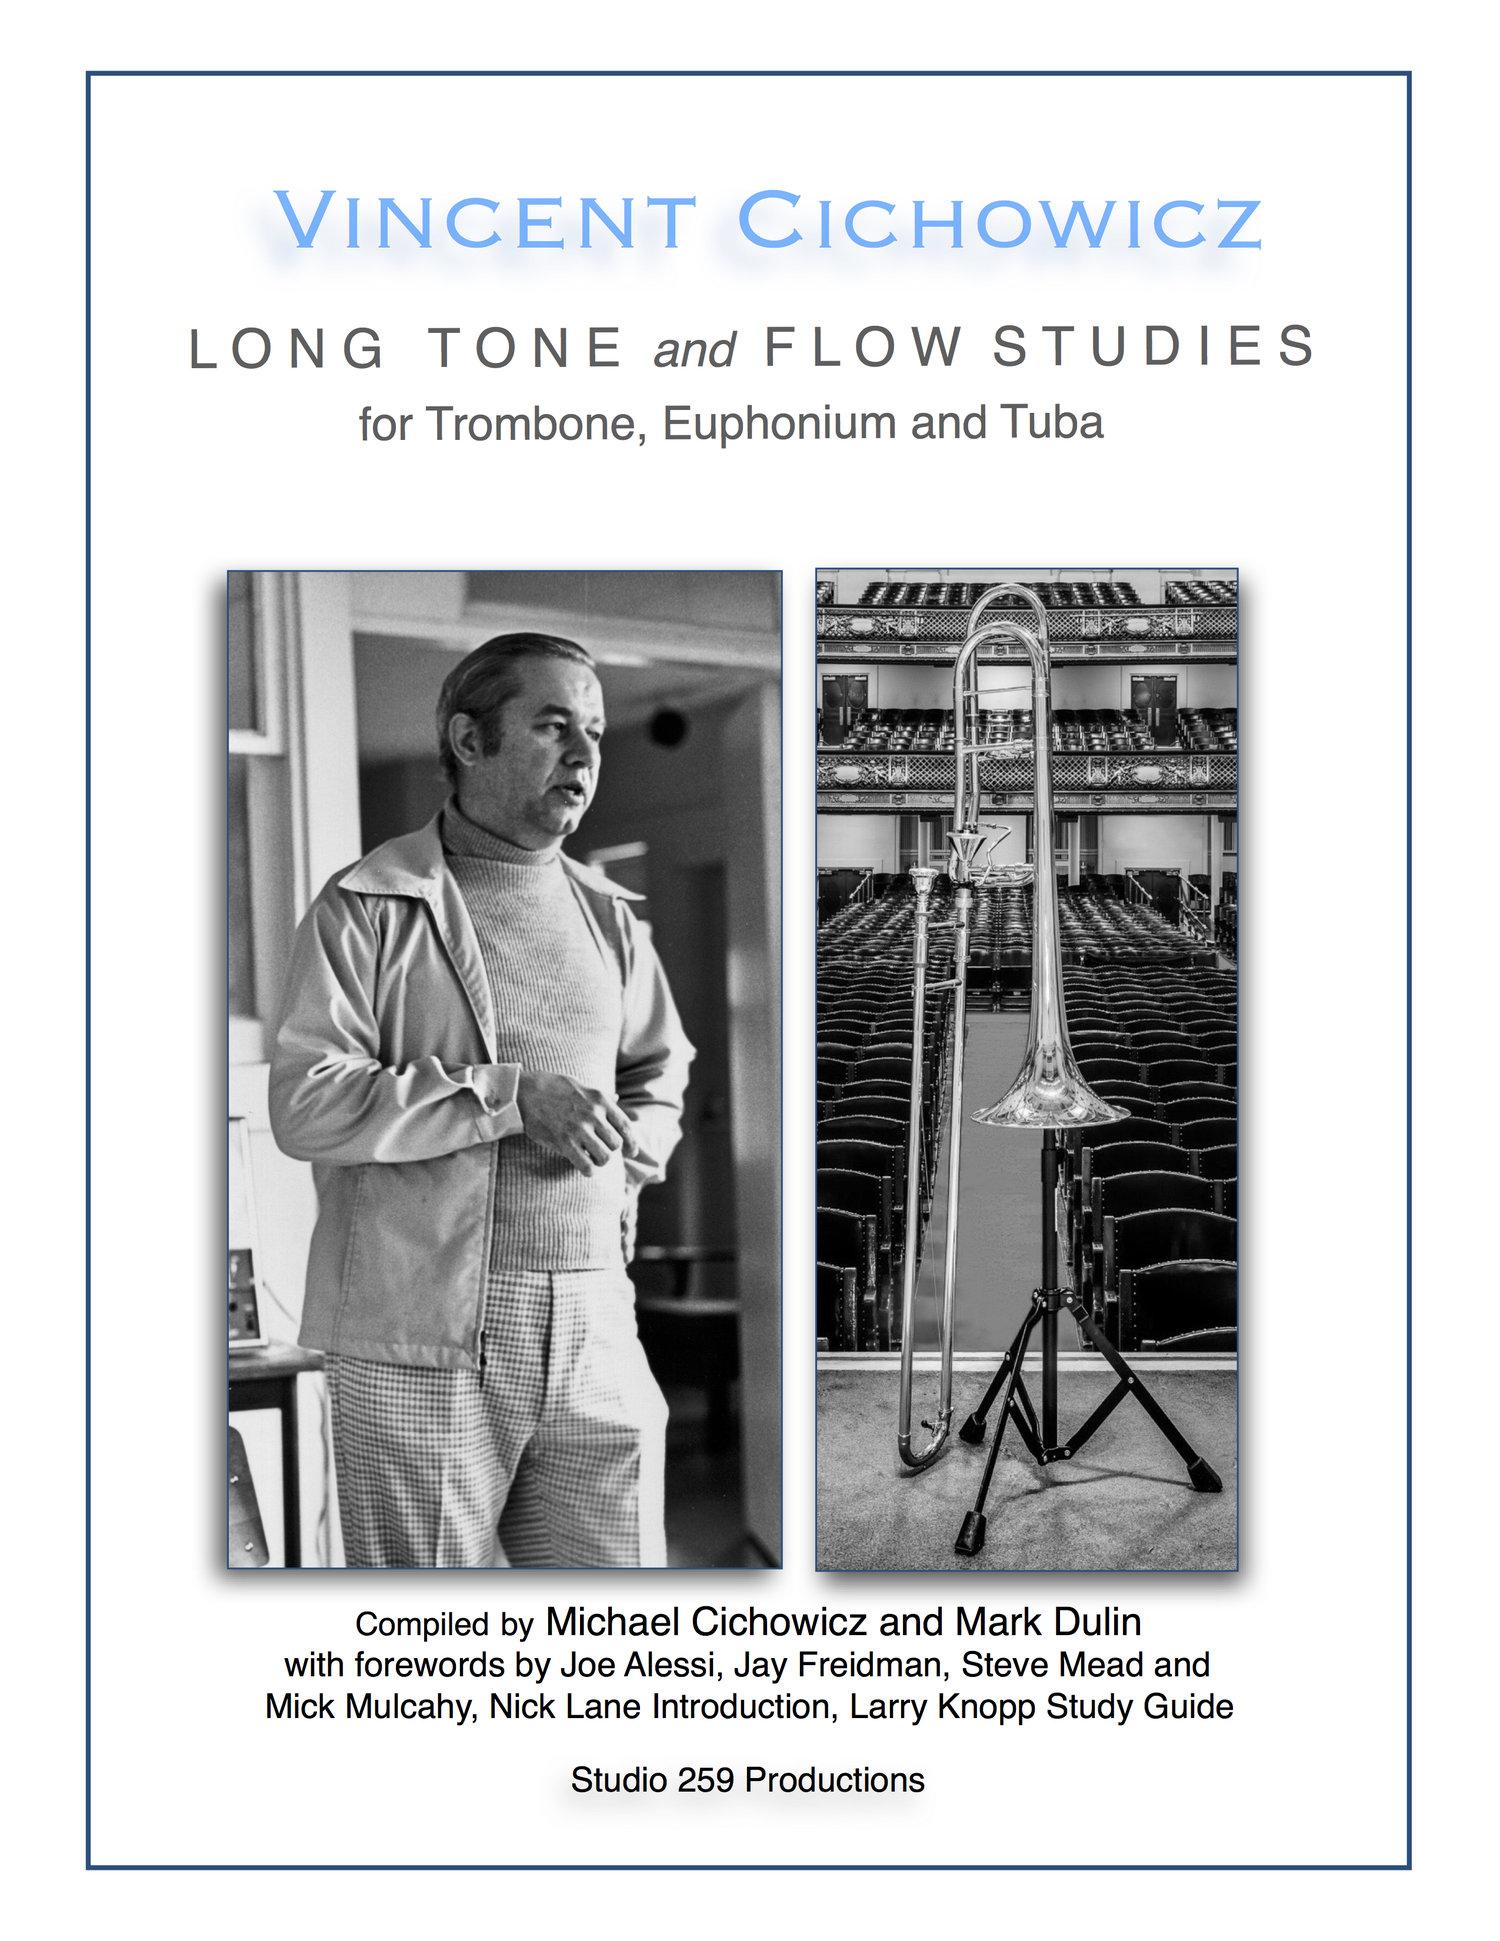 Long Tones and Flow Studies for Trombone, Euphonium and Tuba (Cichowicz) —  Balquhidder Music